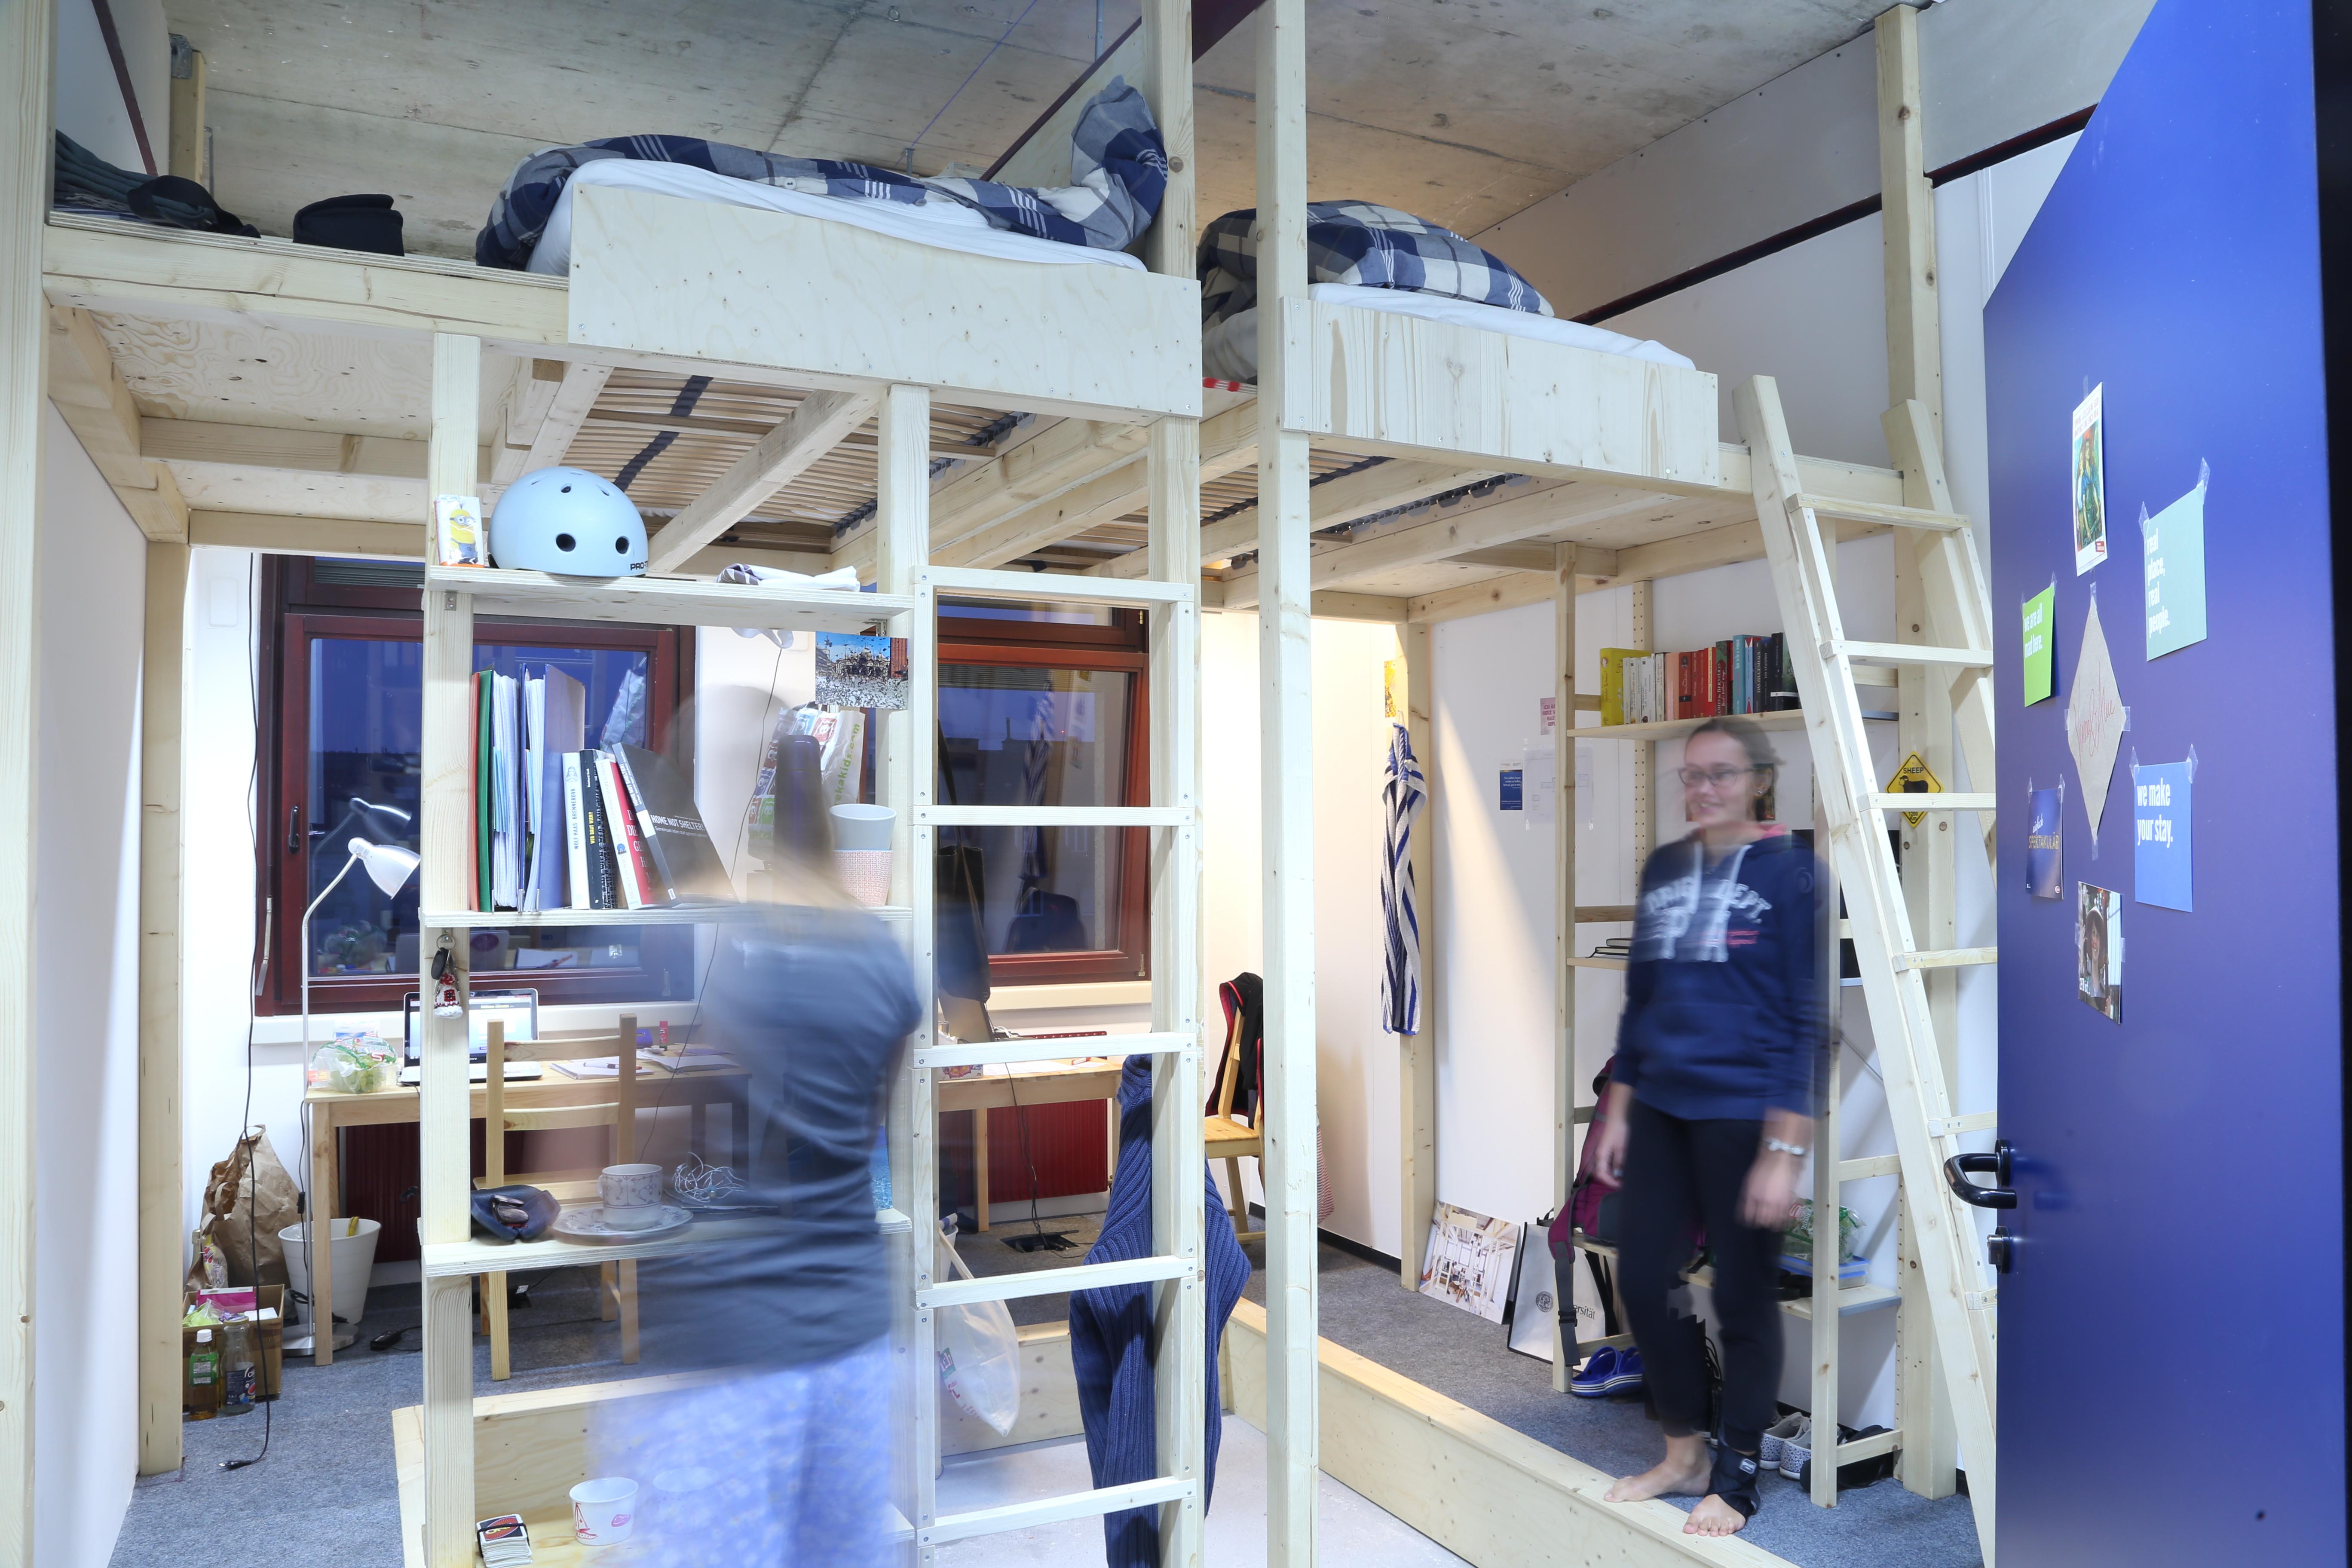 Design Build – Seite 3 – Home not Shelter!